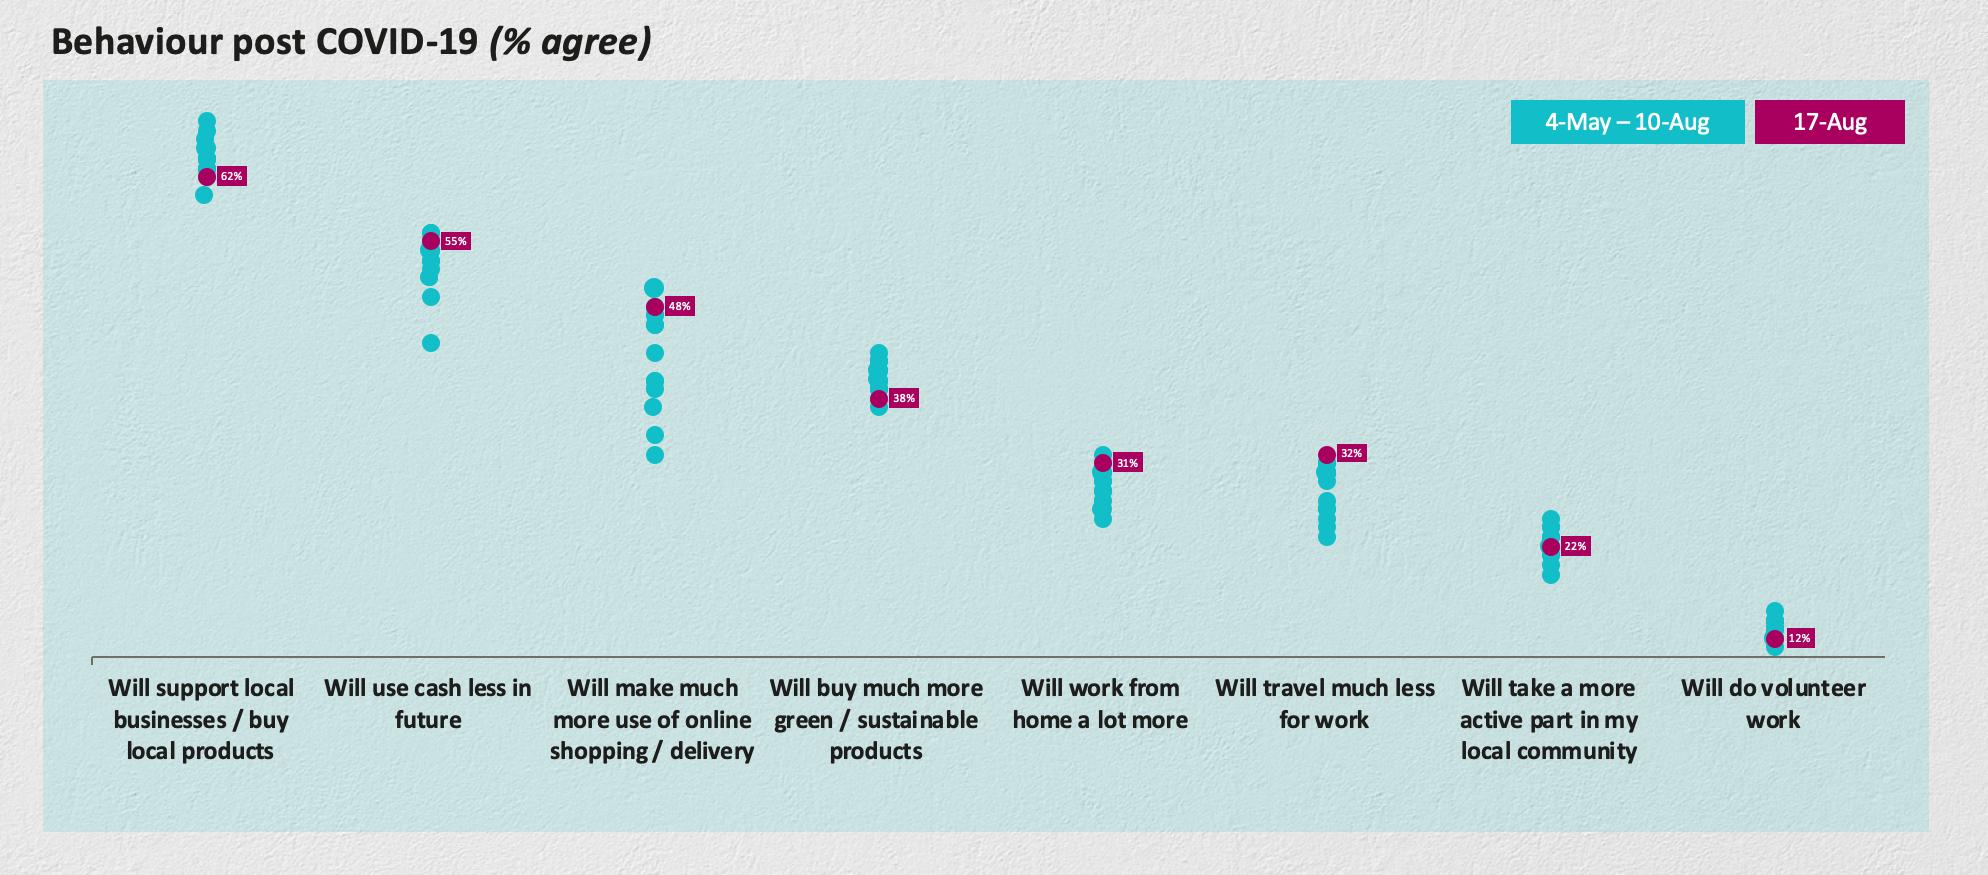 Behaviour post COVID-19 chart